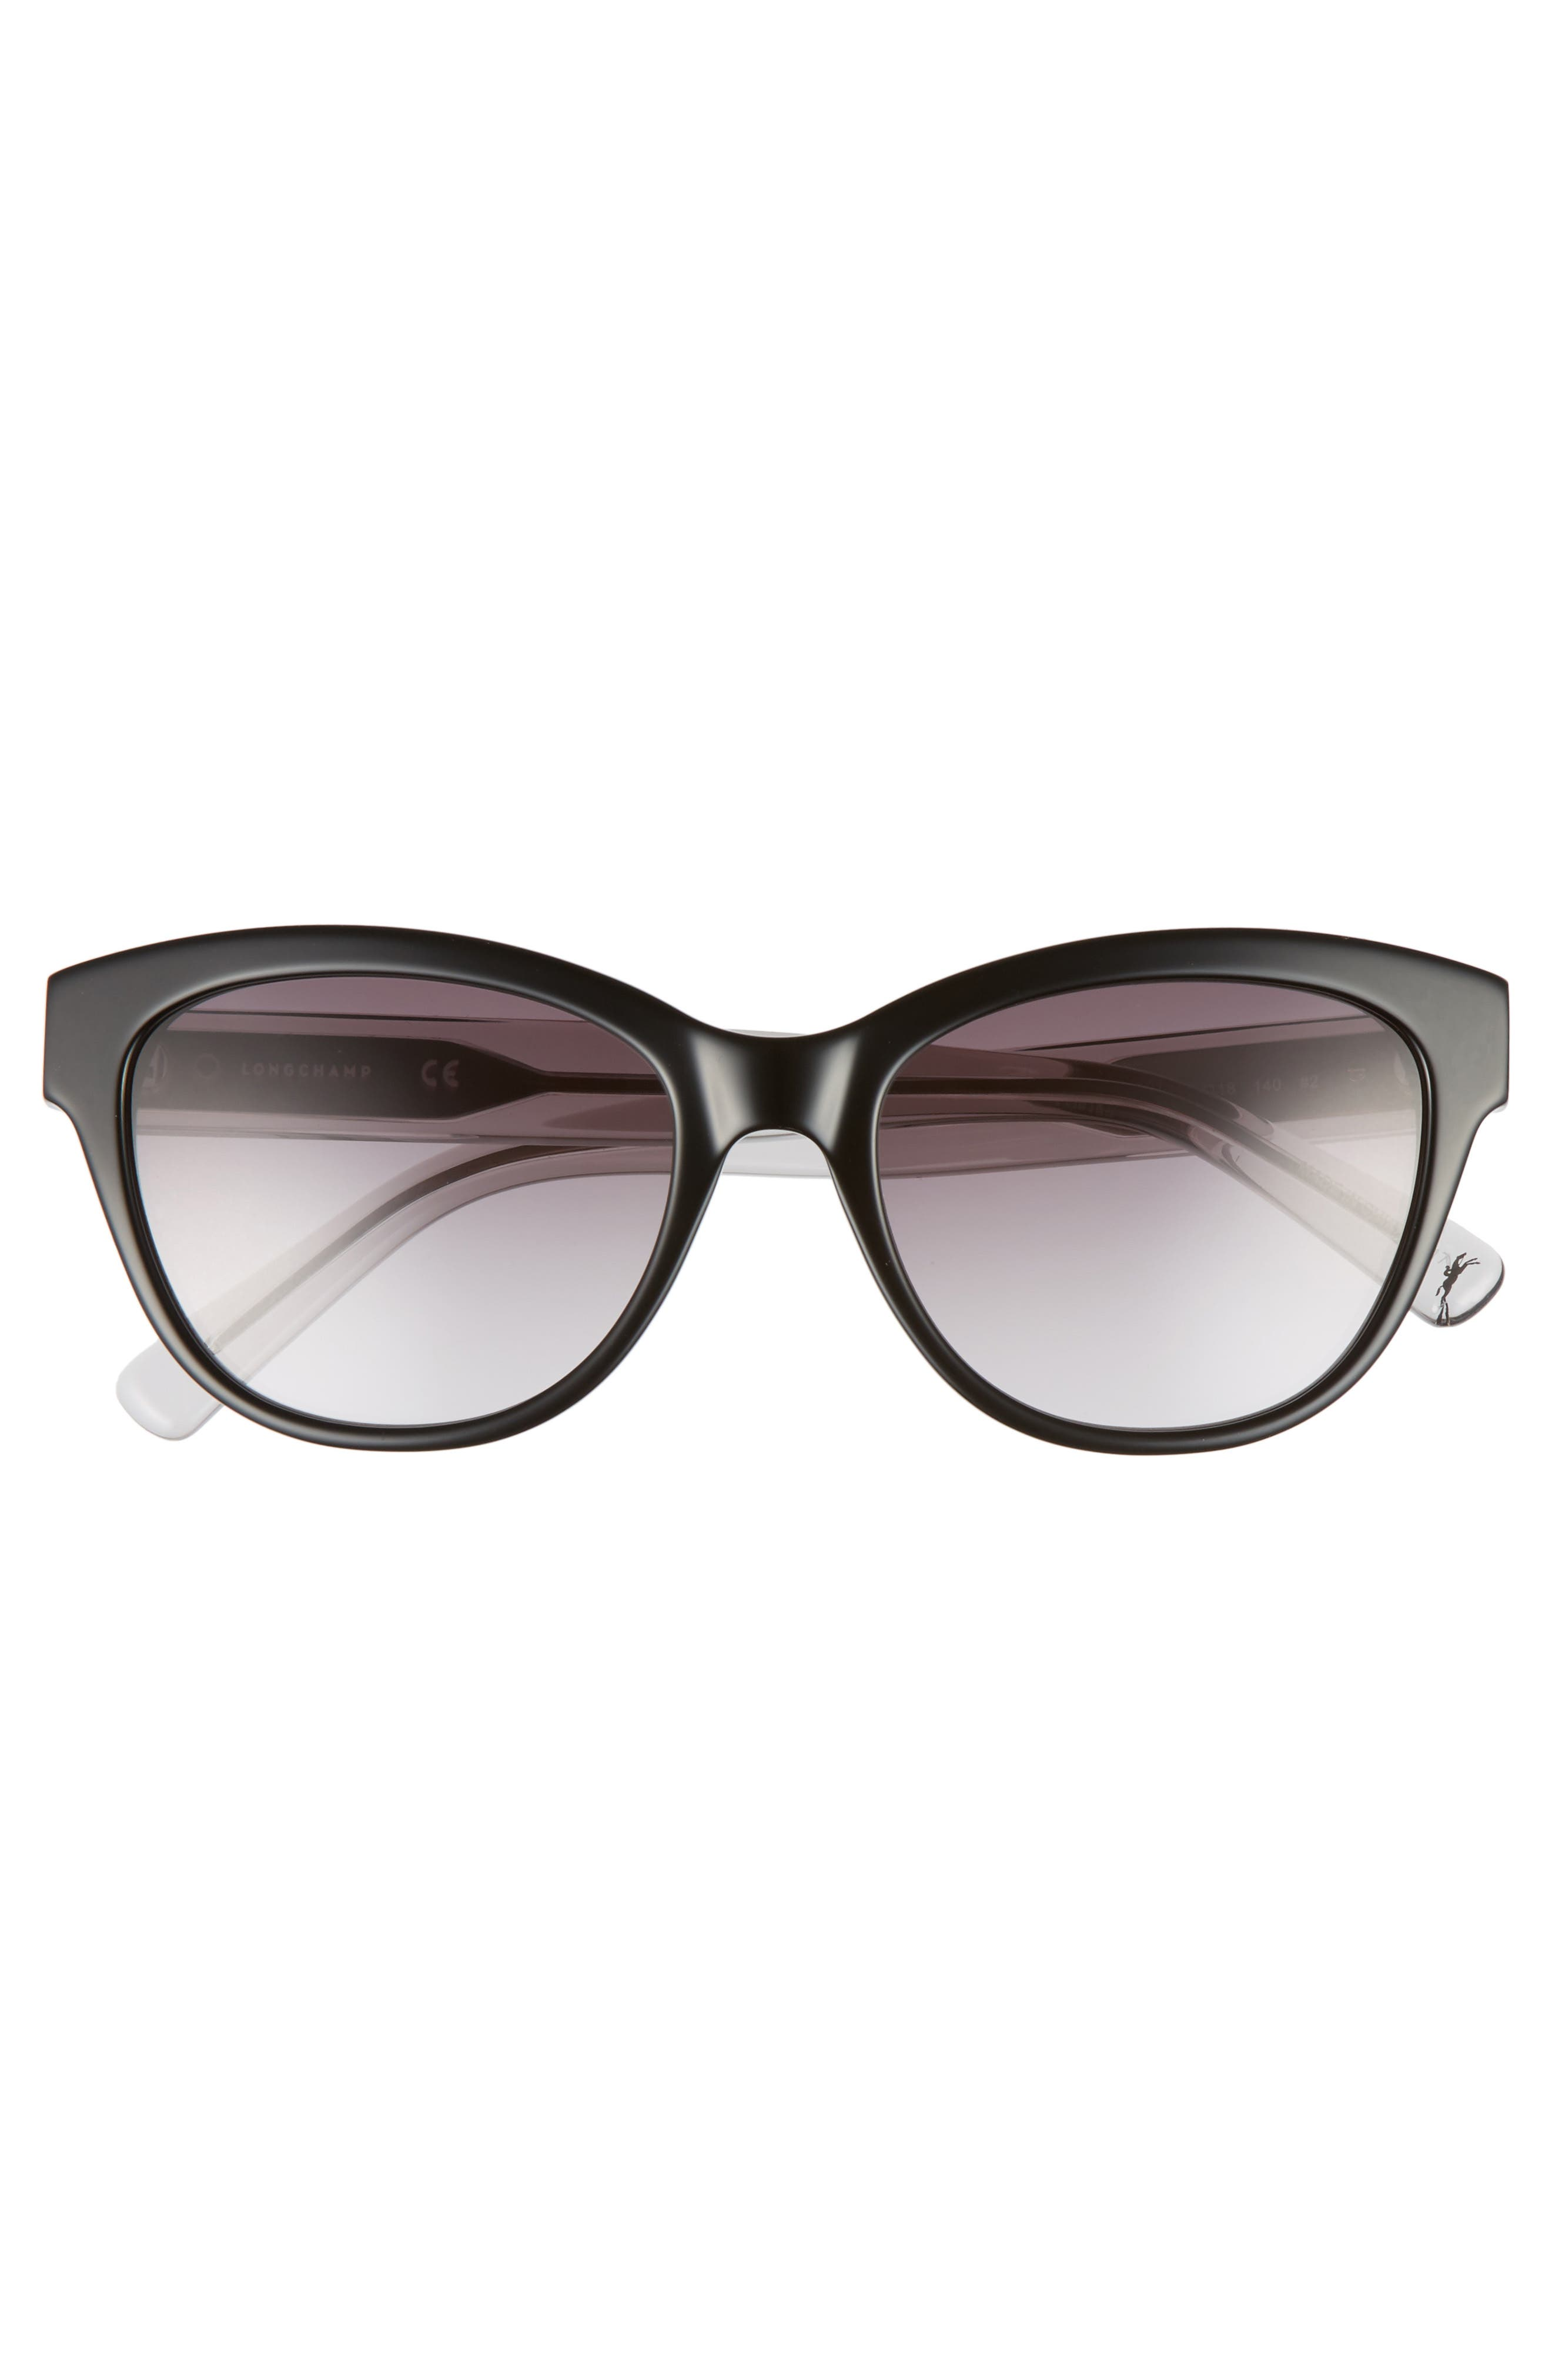 54mm Gradient Lens Sunglasses,                             Alternate thumbnail 3, color,                             Black